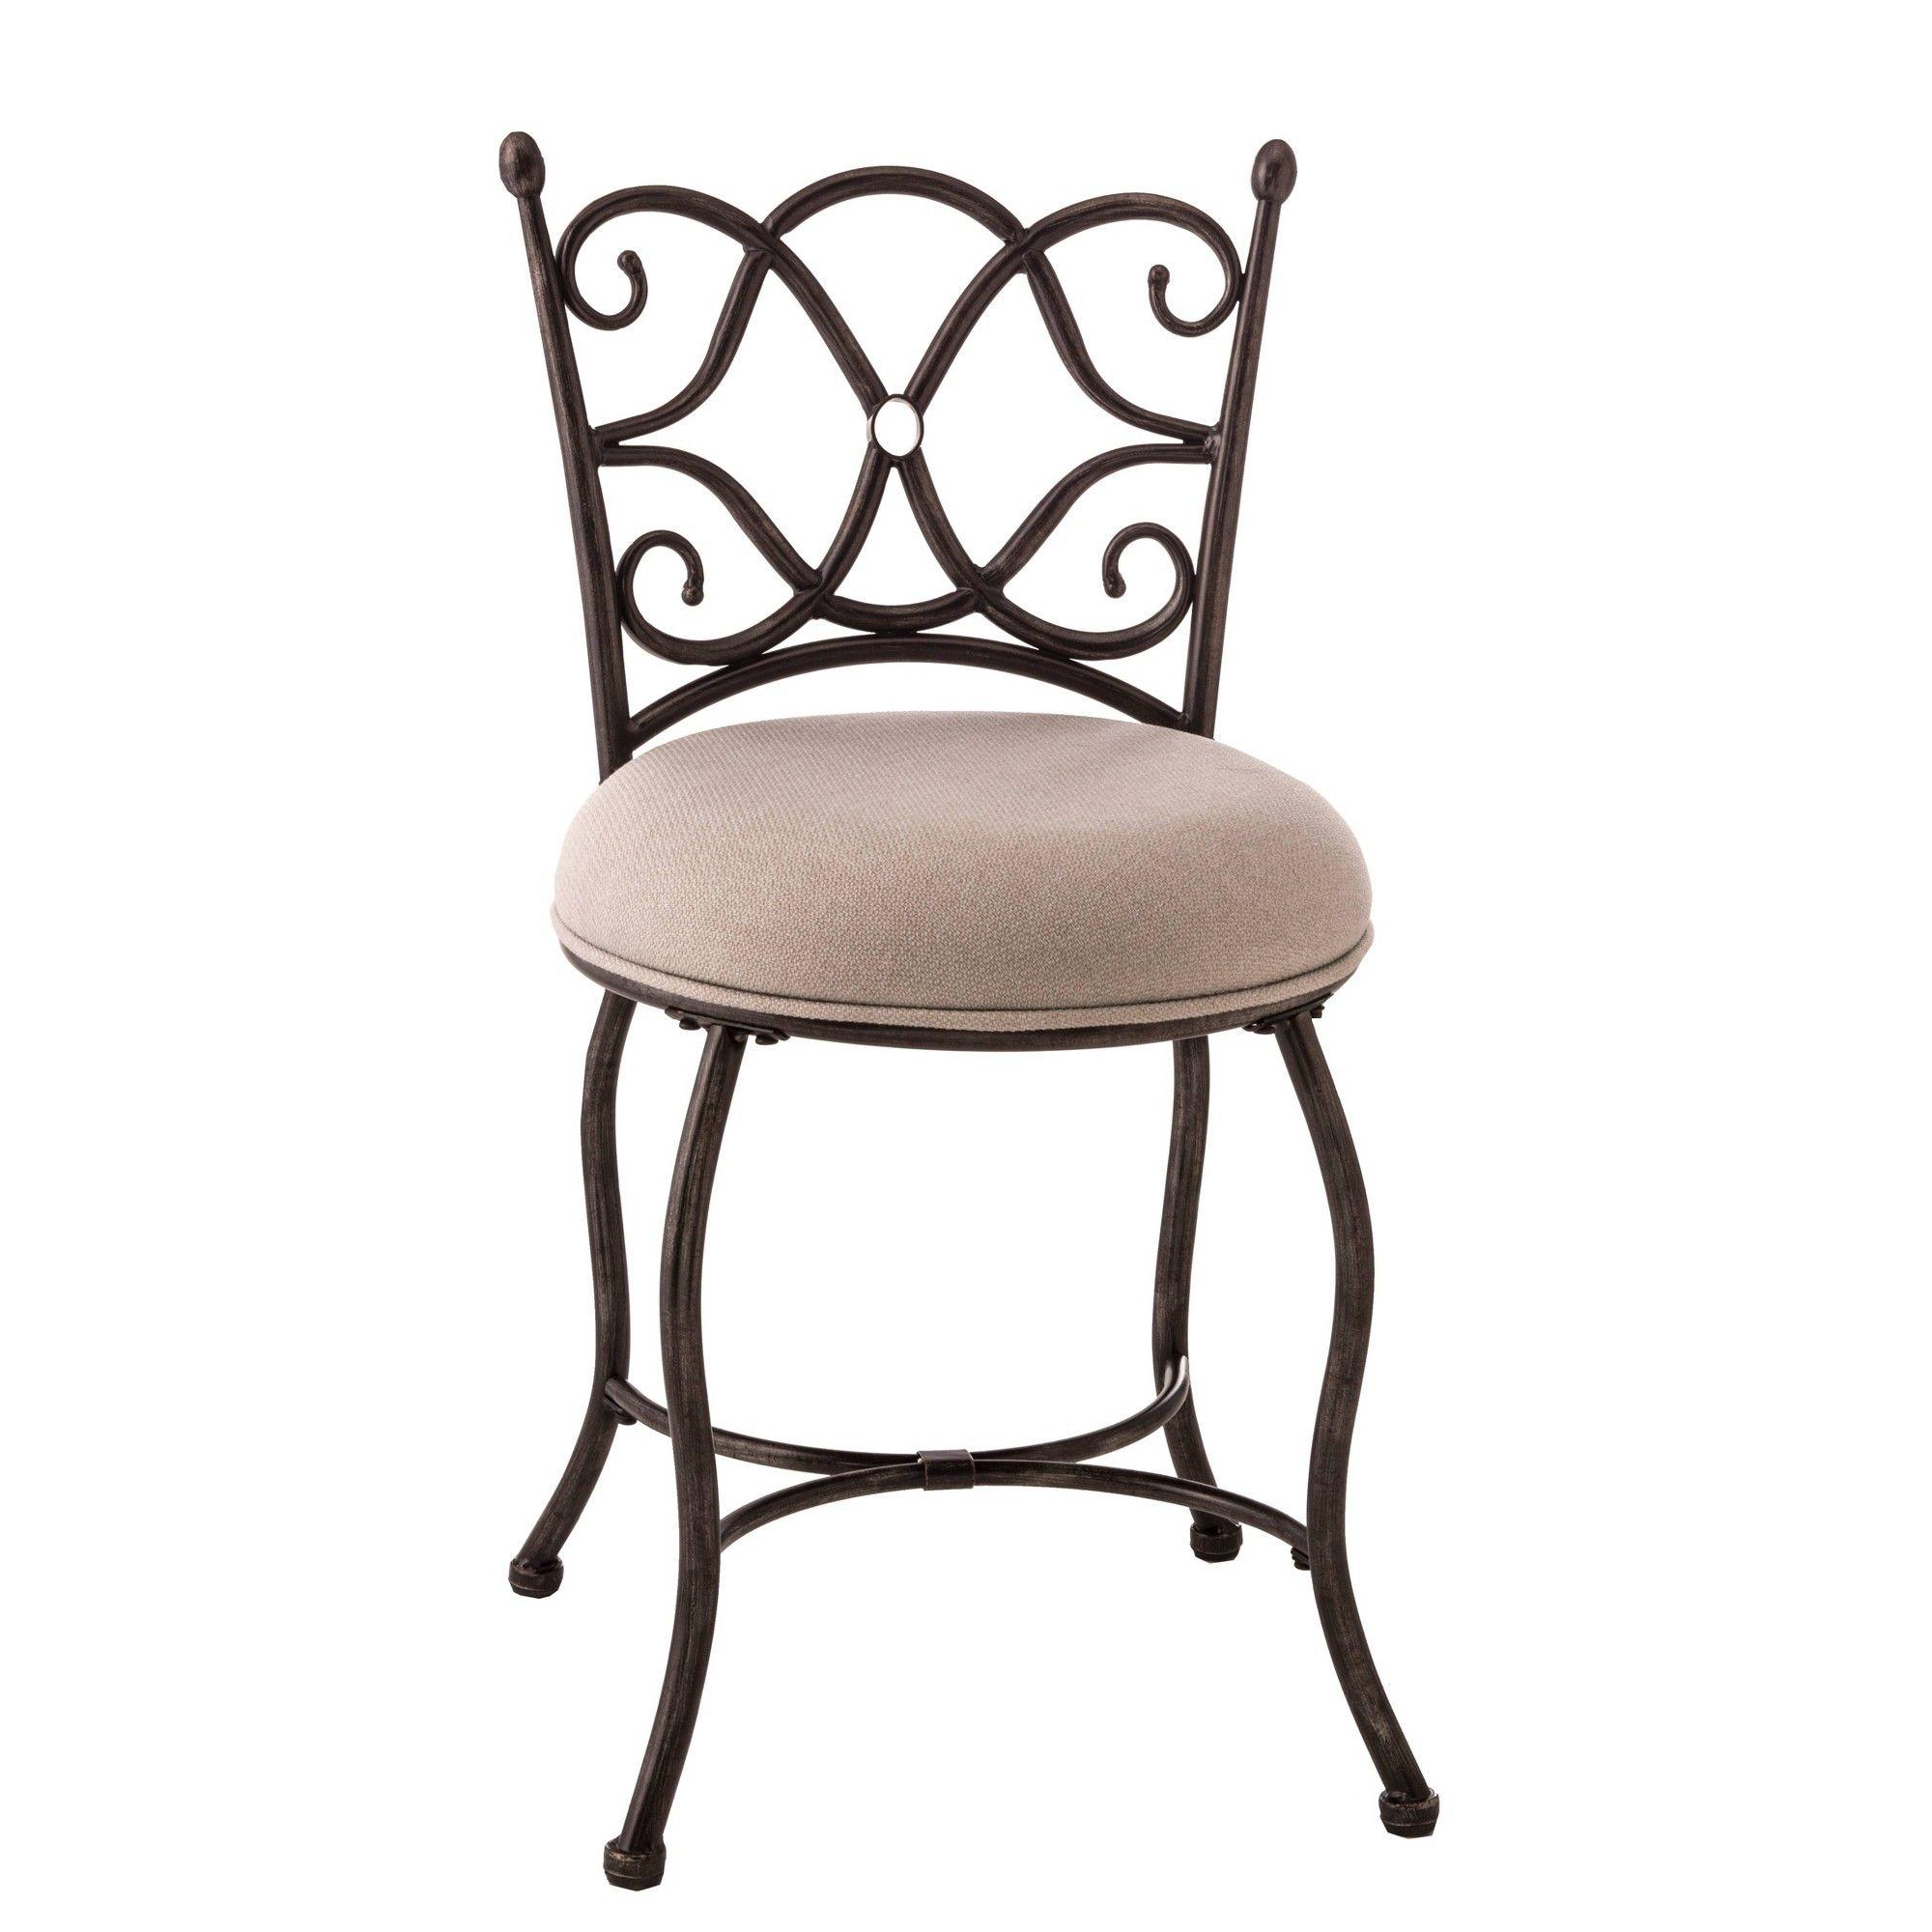 31 Brody Vanity Gray Hillsdale Furniture With Images Vanity